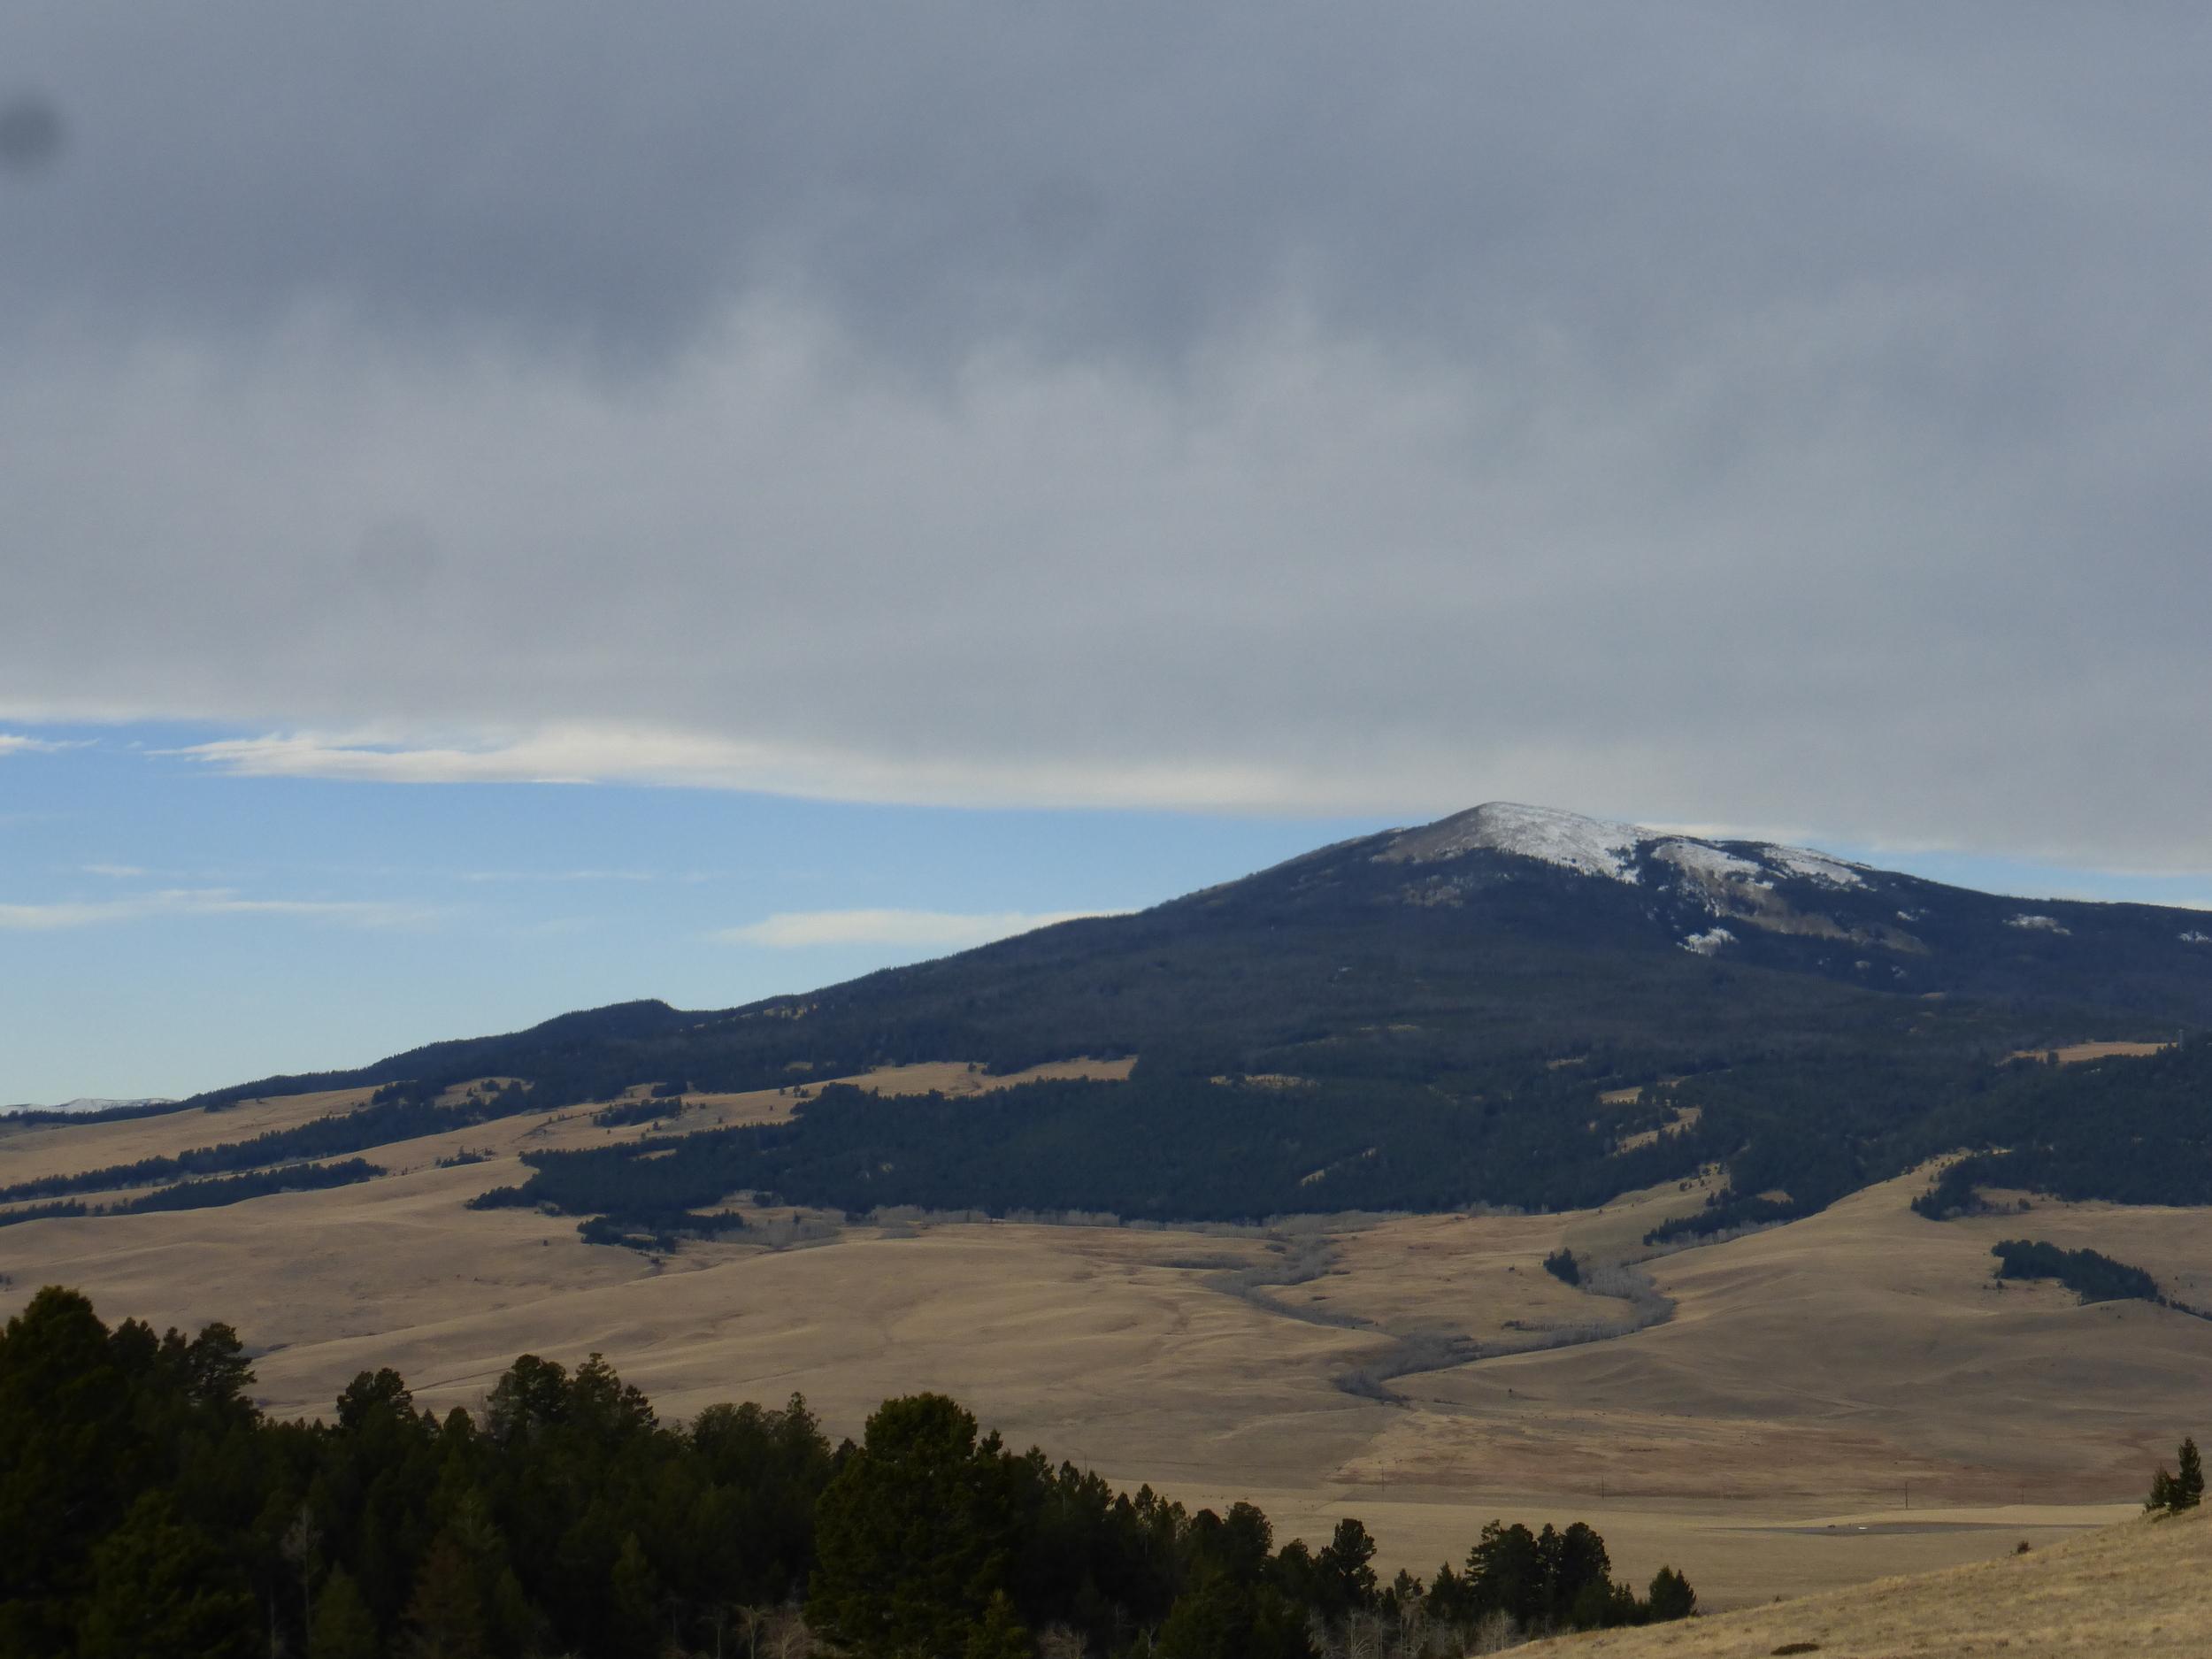 Mount Fleecer